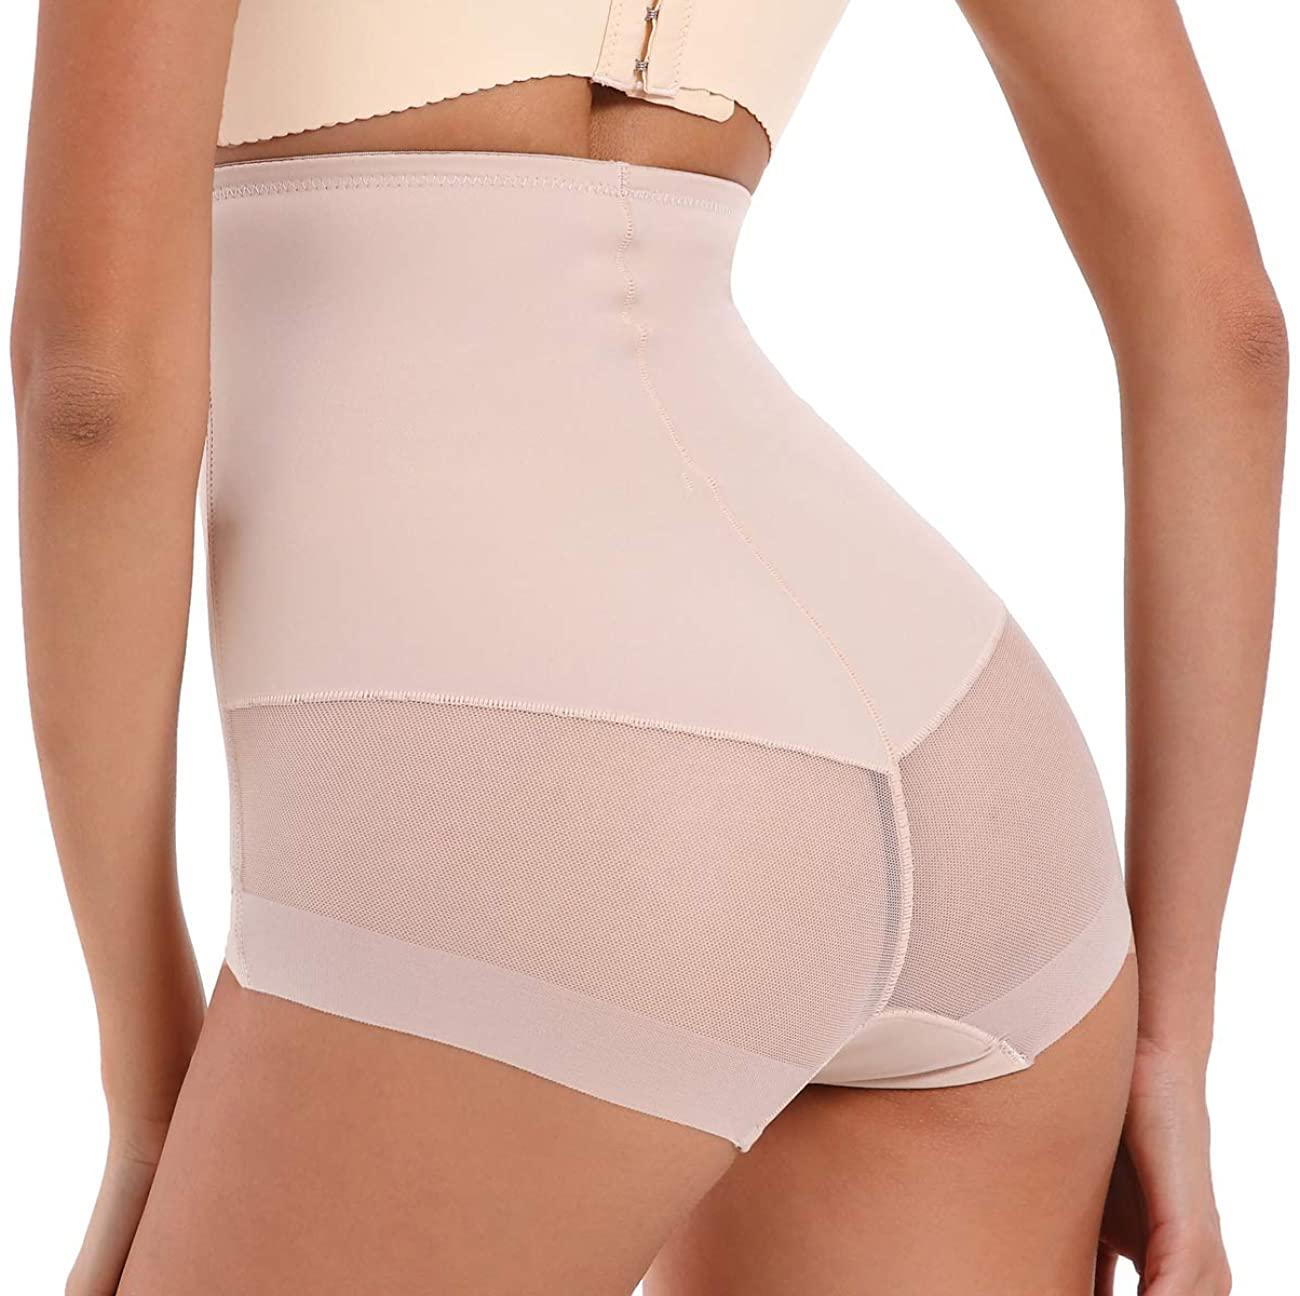 Larry&Marry Women Body Shaper Hi-Waist Tummy Control Panty Shapewear Slim Saist Trainer Butt Lifter Brief